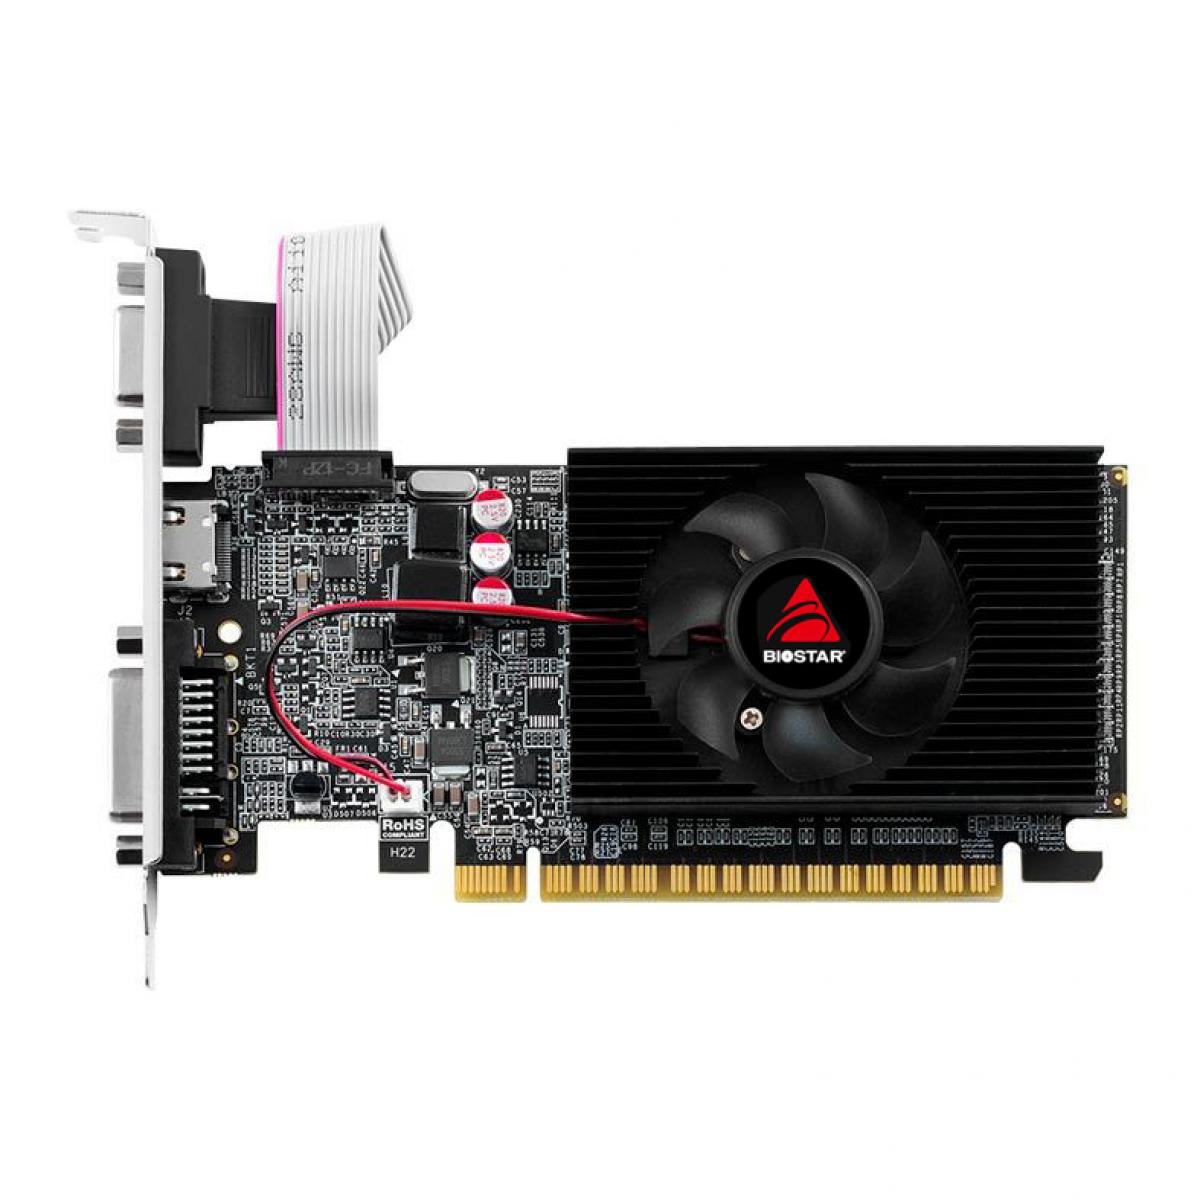 Kit Upgrade Biostar GeForce GT 710 2GB + Ryzen 3 3300x + Biostar A320MH + Cooler de Brinde